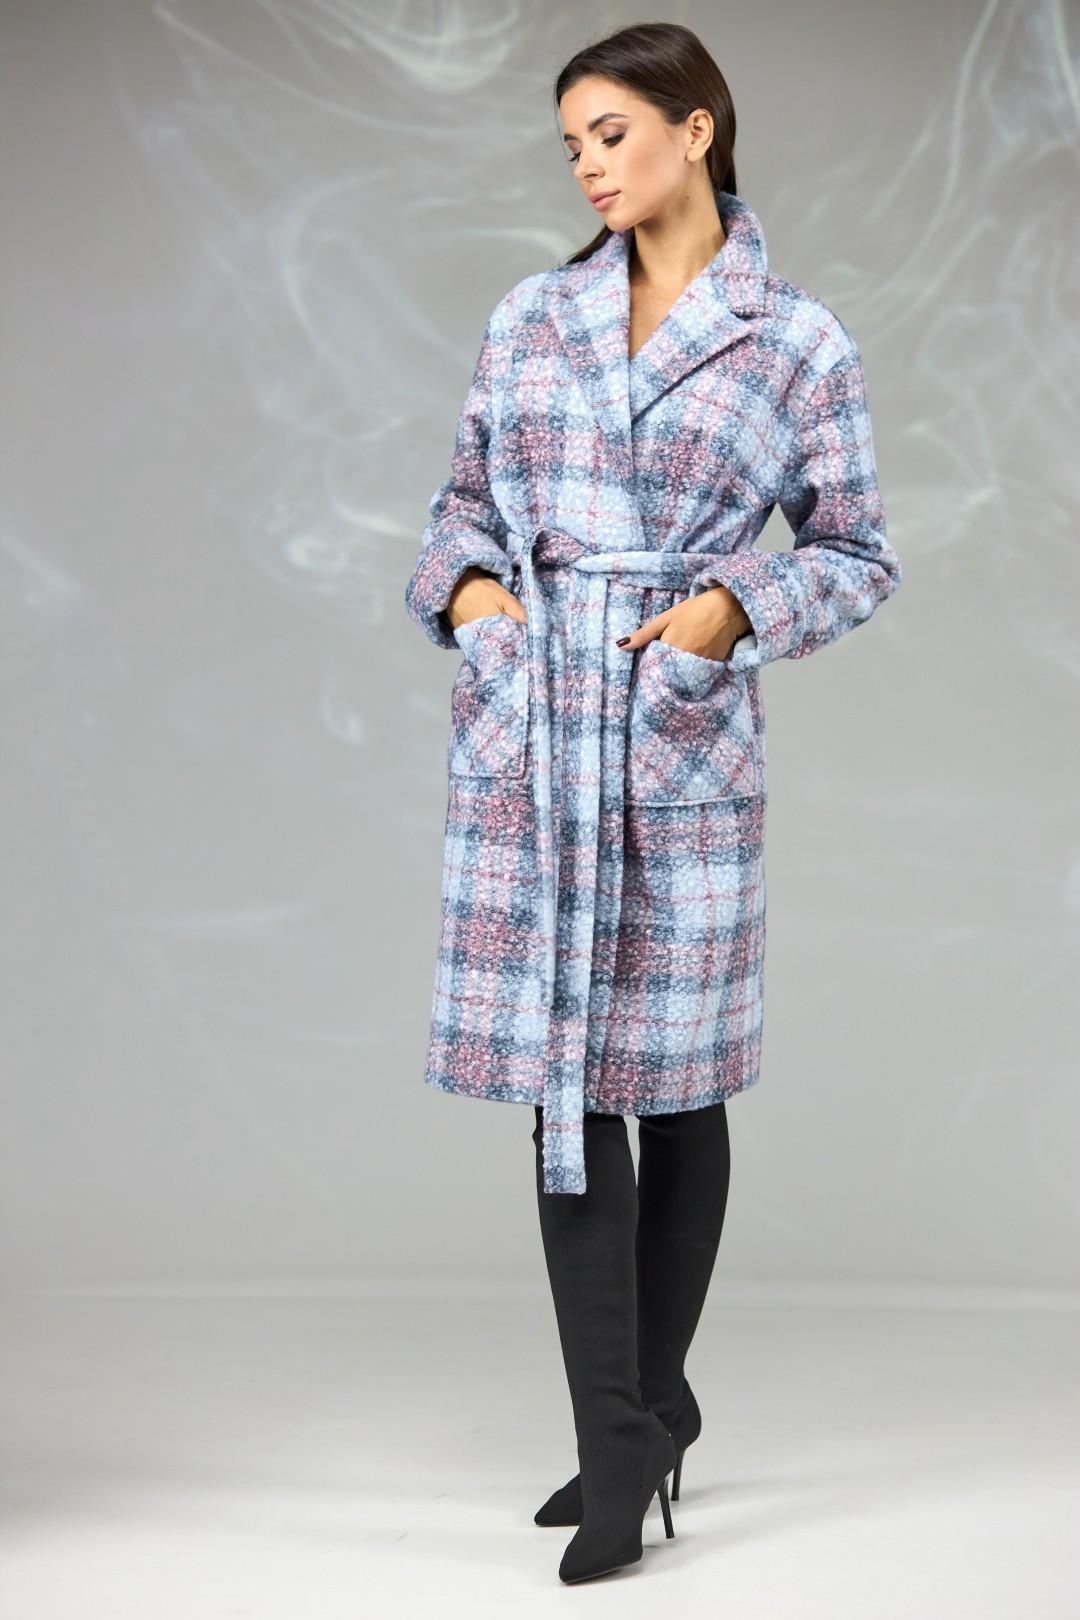 Пальто Angelina & Company 603 клетка